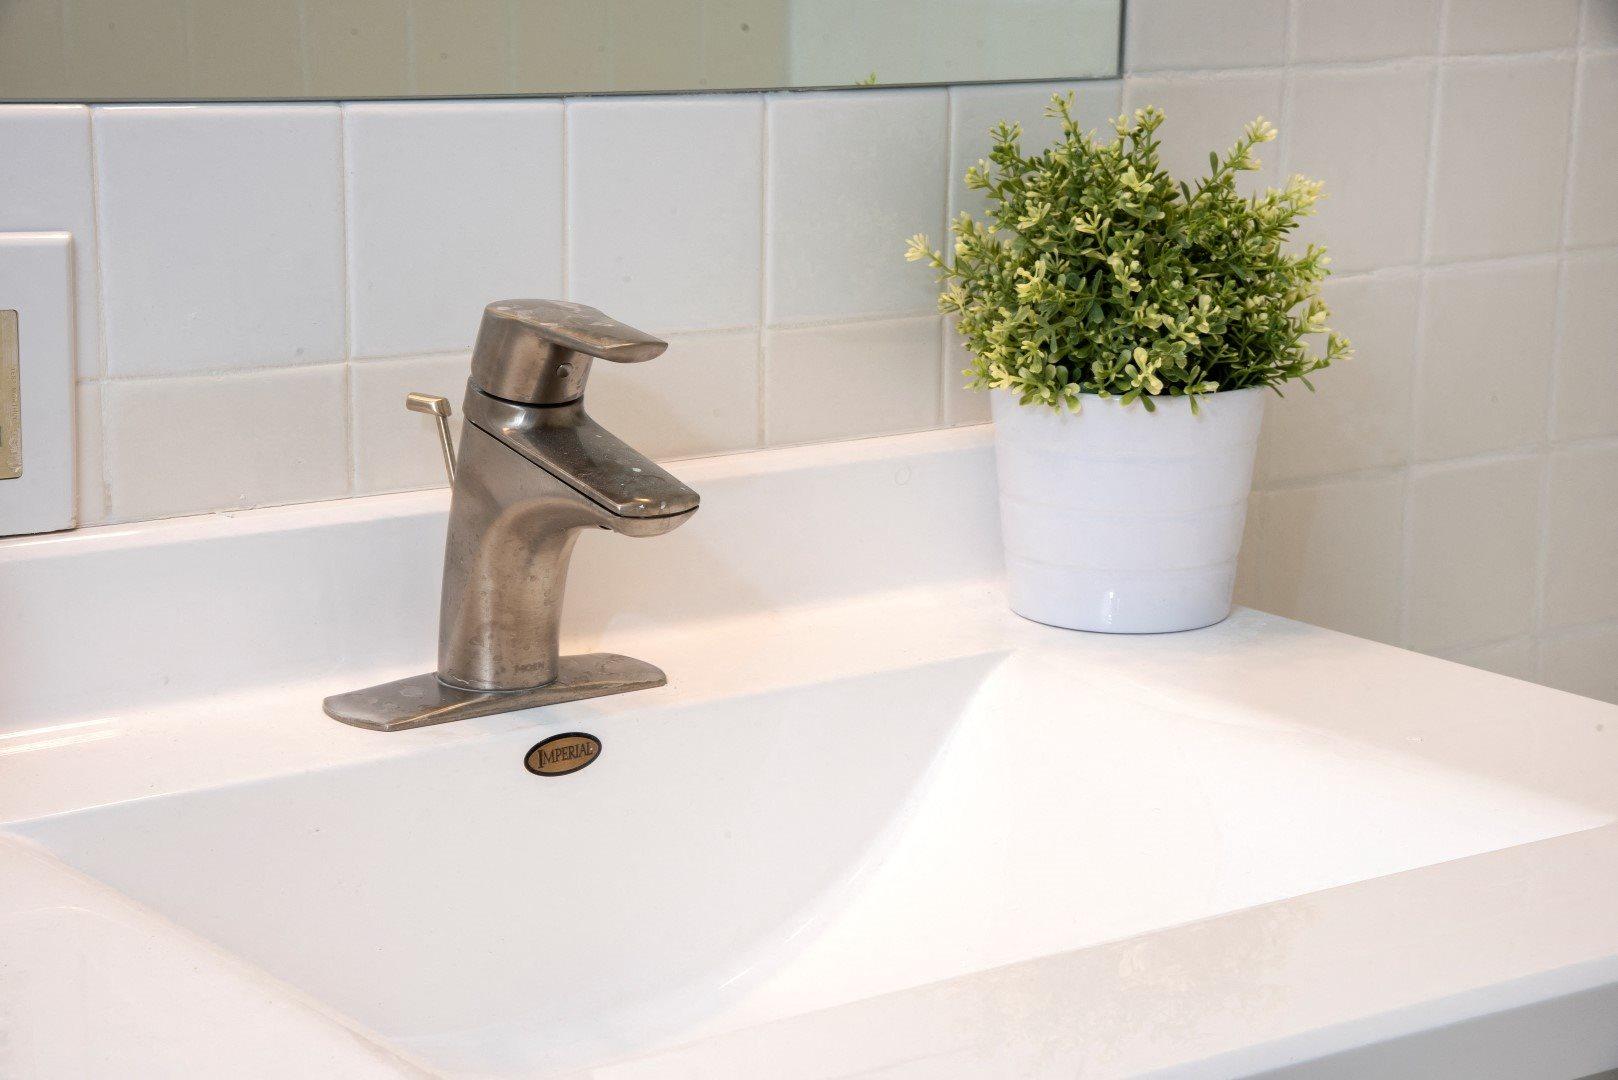 White Tile Back Splash and Deep Sink in Bathroom of Minneapolis Apartment